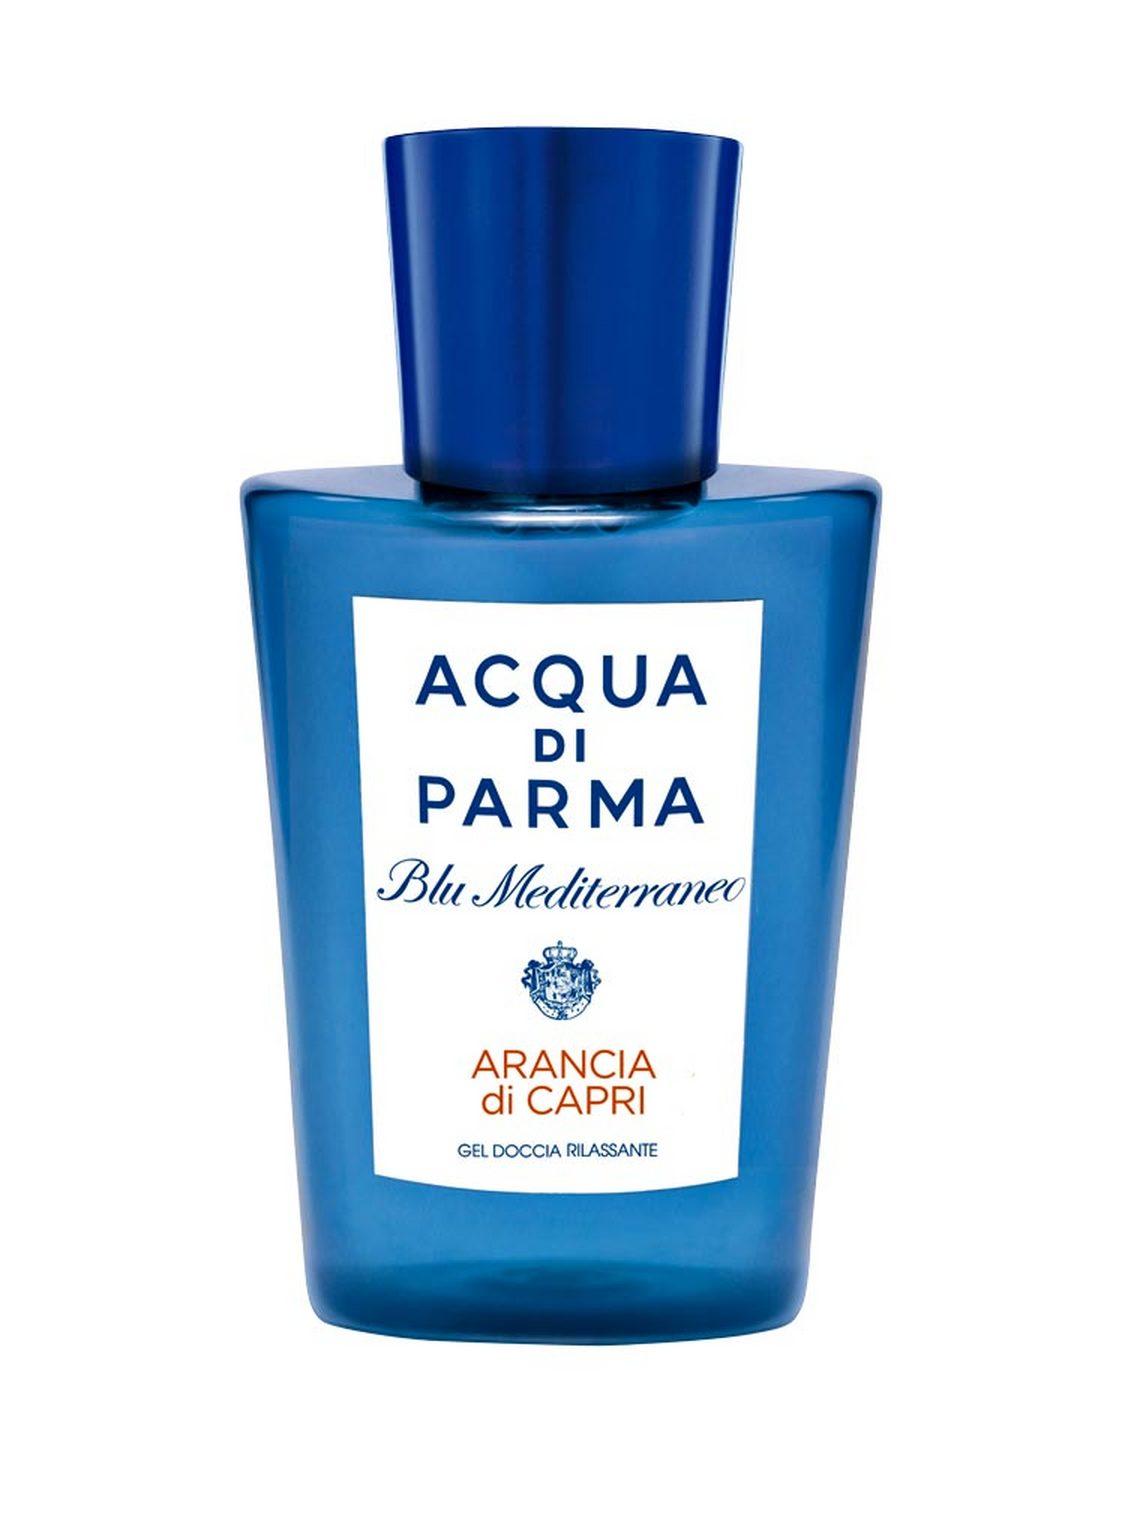 Image of Acqua Di Parma Arancia Di Capri Shower Gel 200 ml